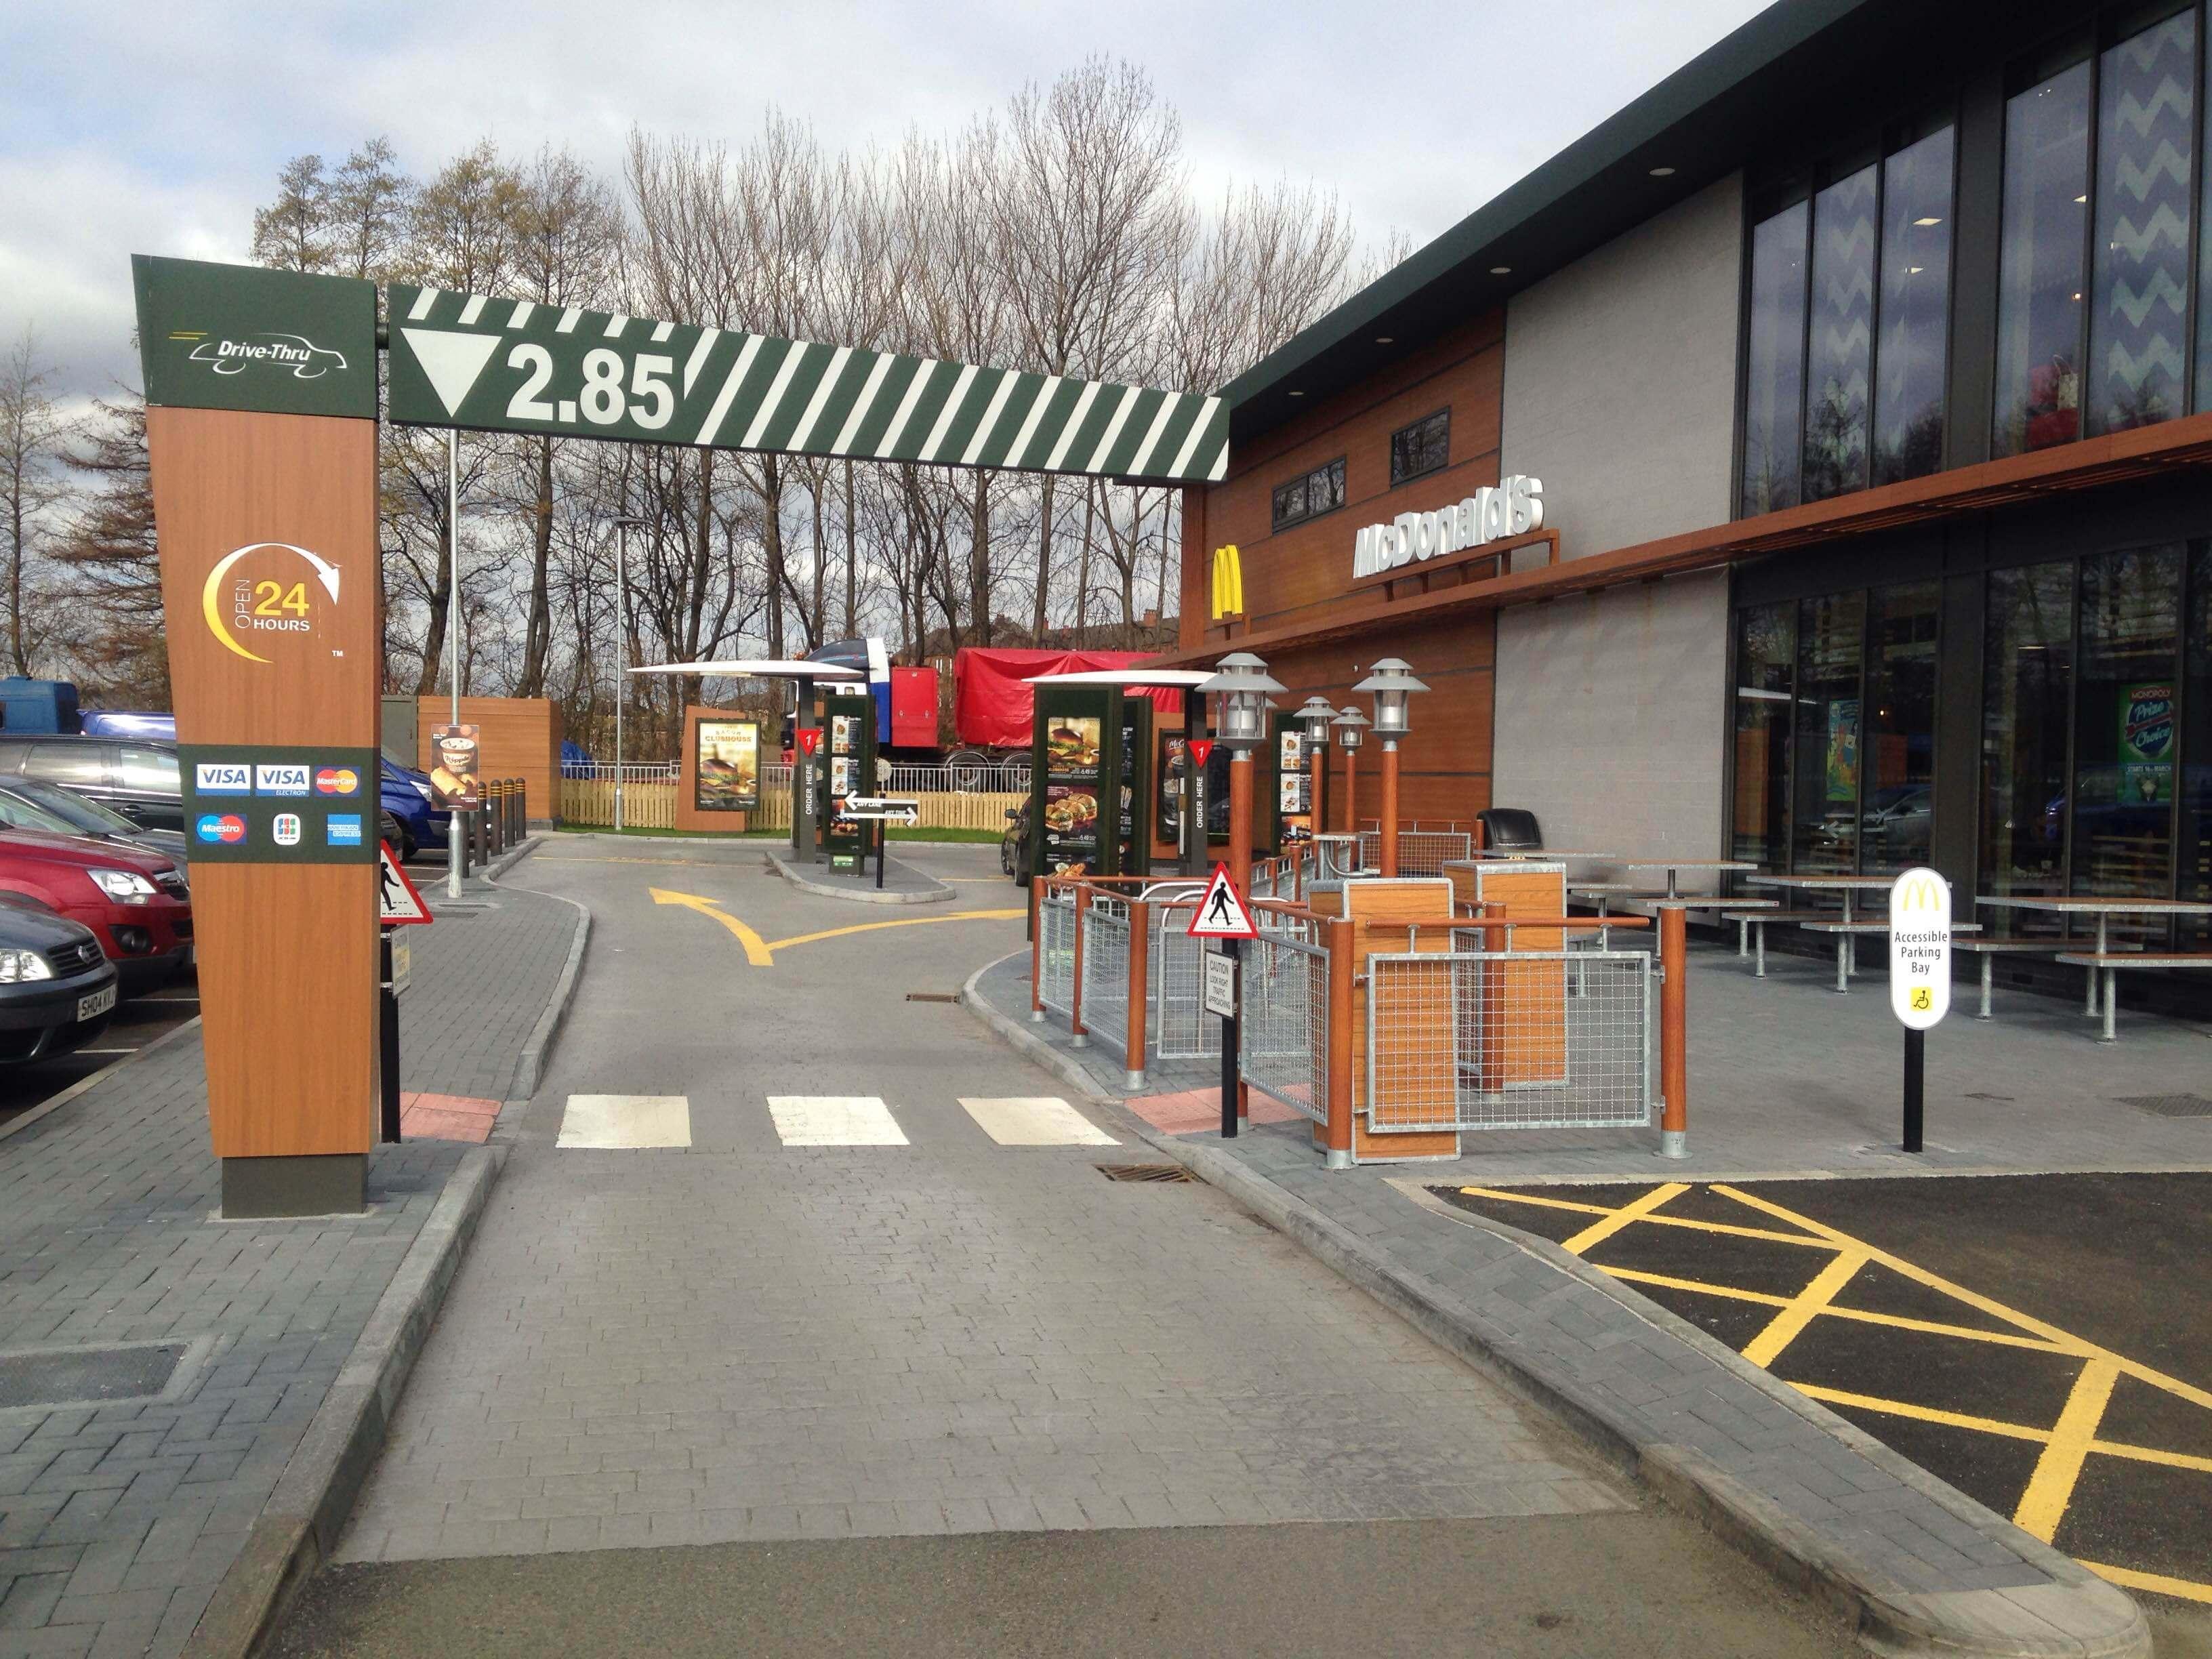 McDonalds drive thru lane